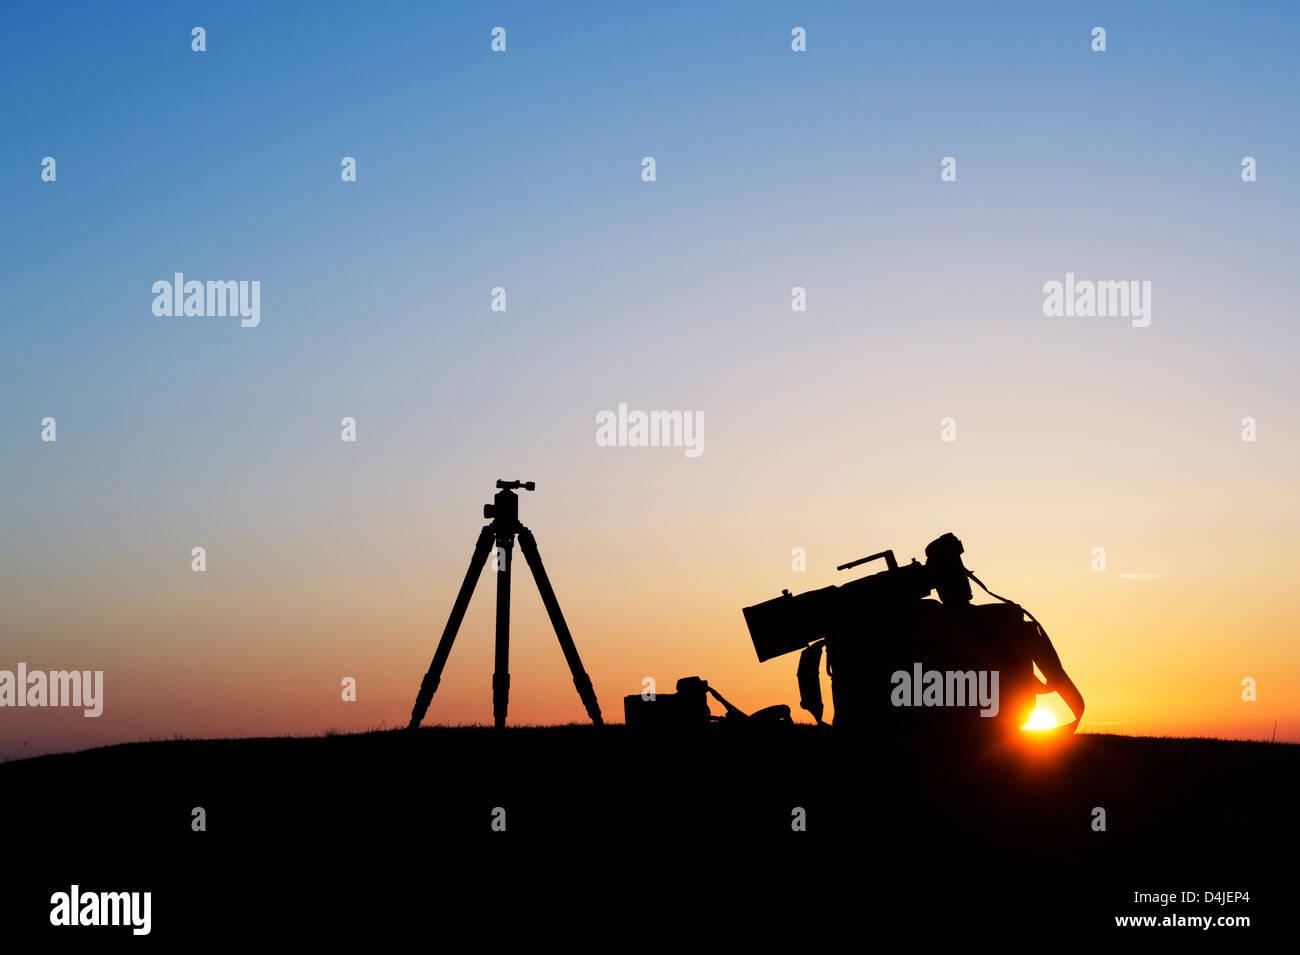 Camera equipment at sunrise. Silhouette - Stock Image